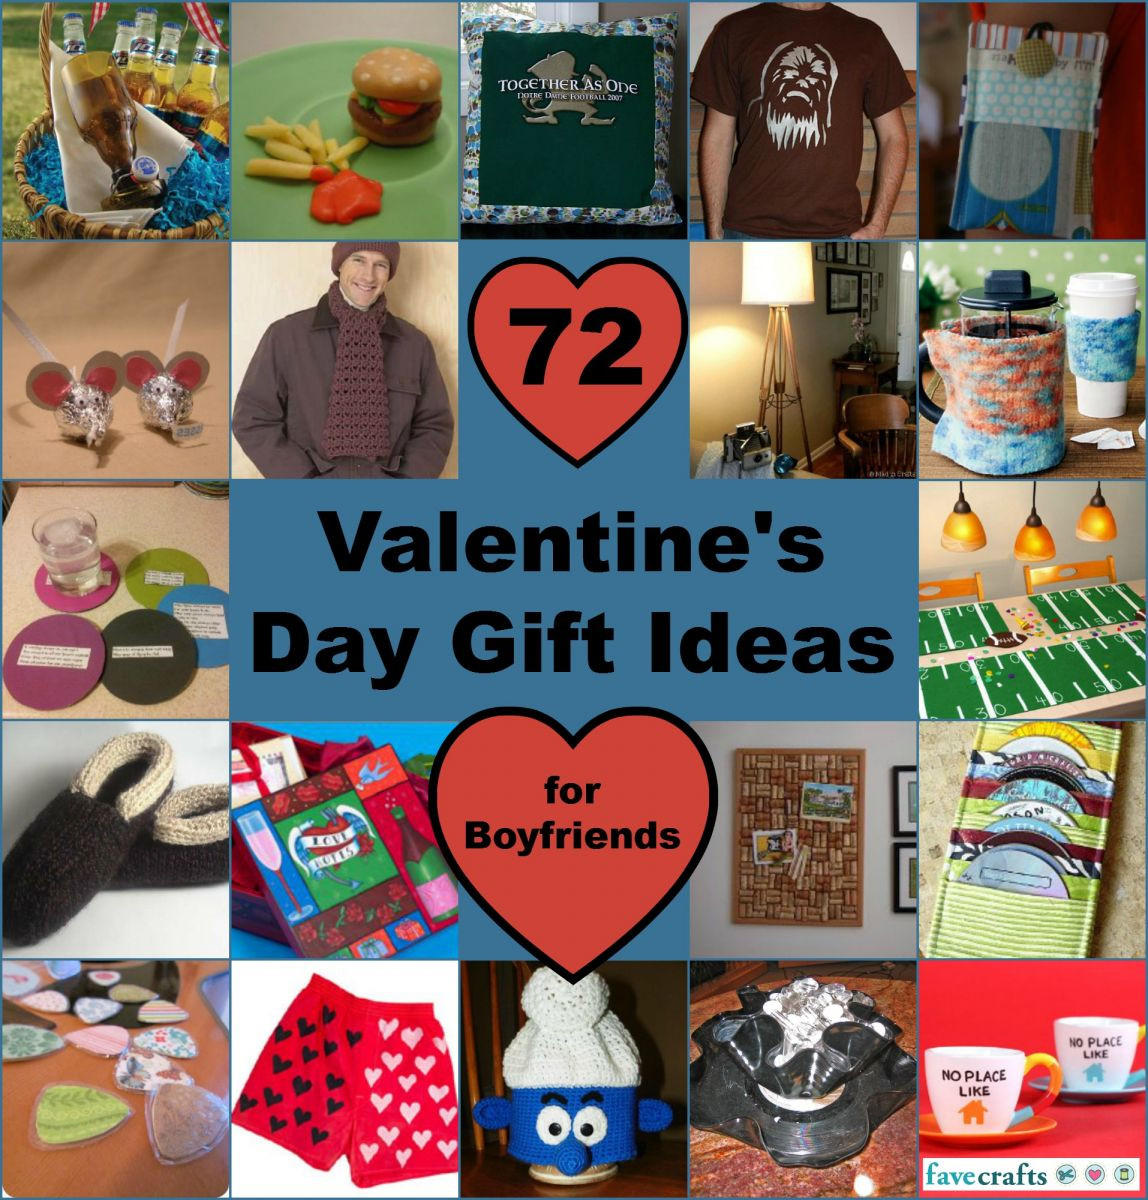 Best ideas about Valentines Gift Ideas For Boyfriend . Save or Pin 72 Valentine s Day Ideas for Boyfriend Now.